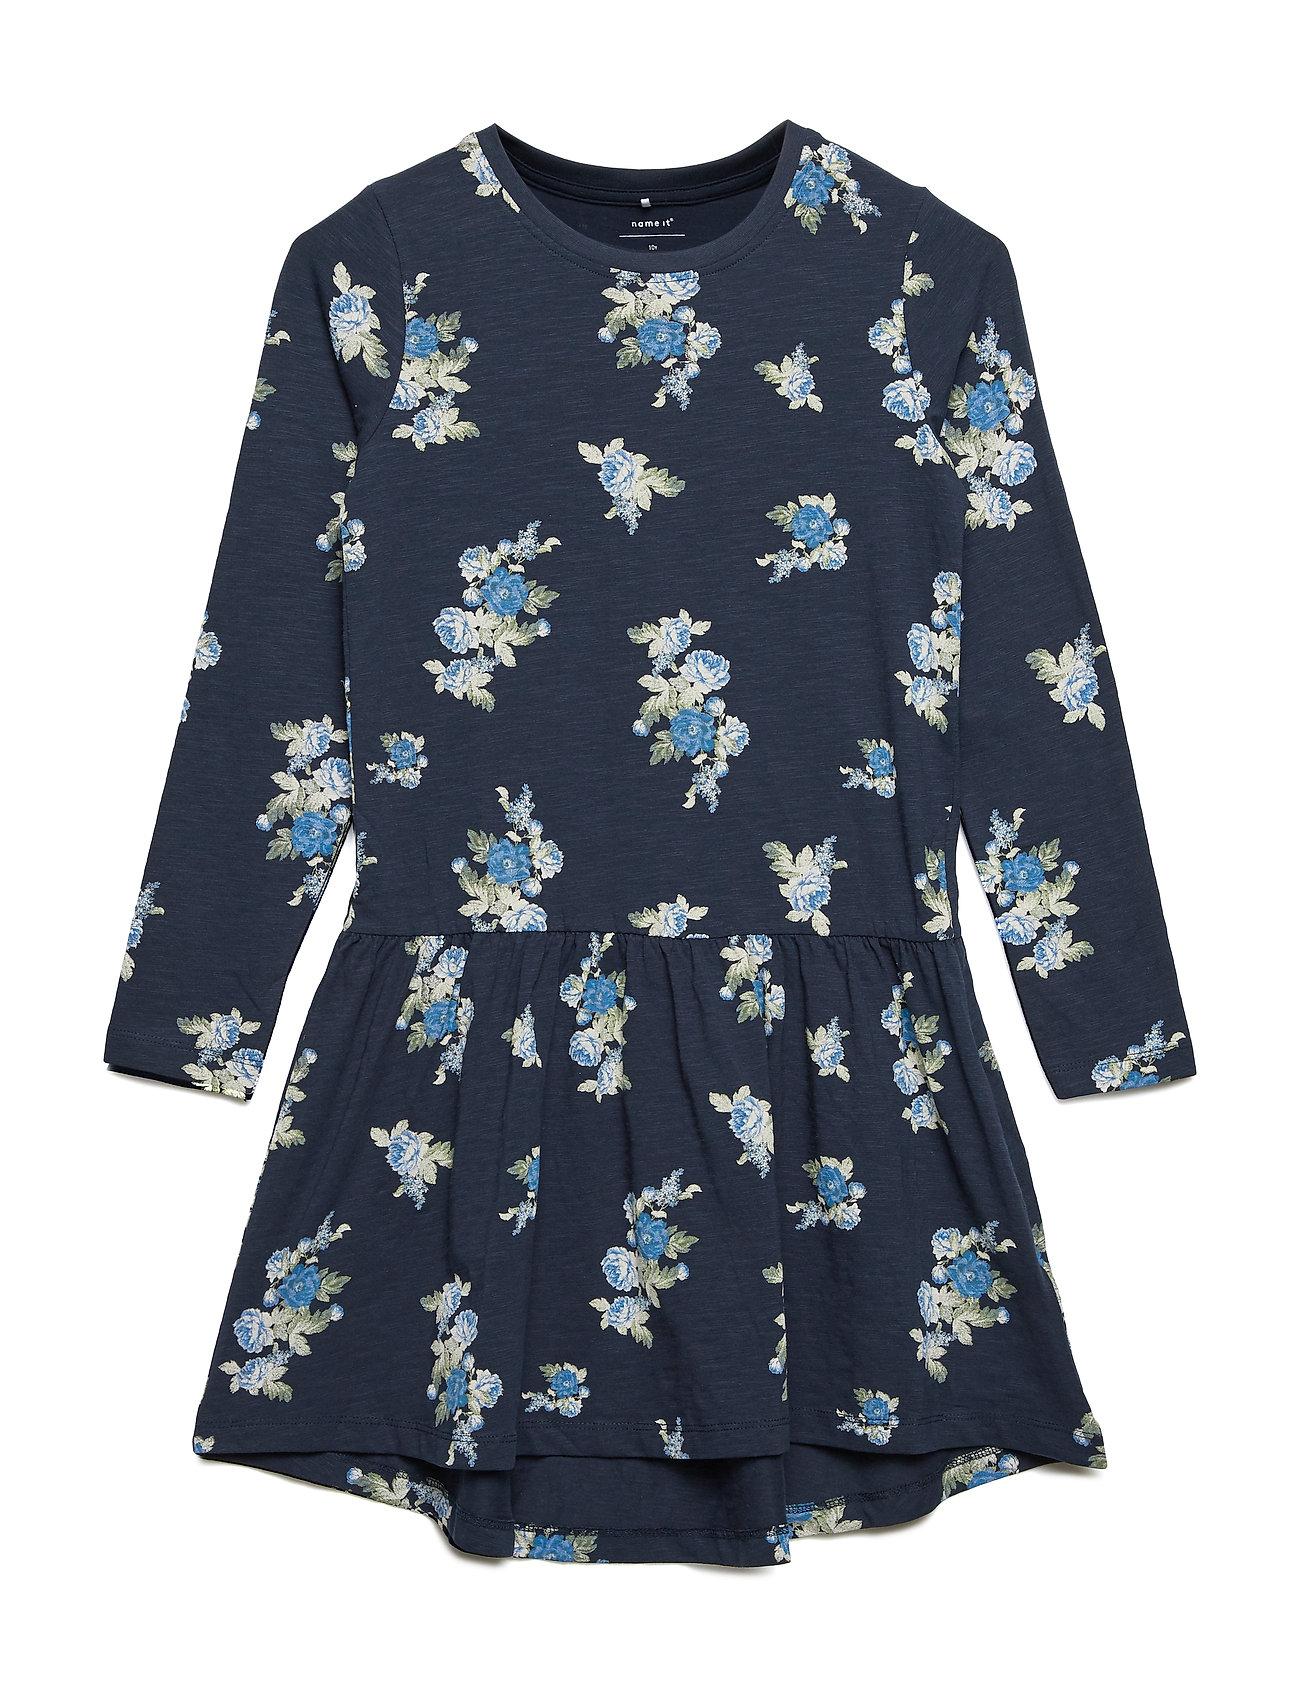 Image of Nkfbilla Ls Dress Kjole Blå NAME IT (3111745723)